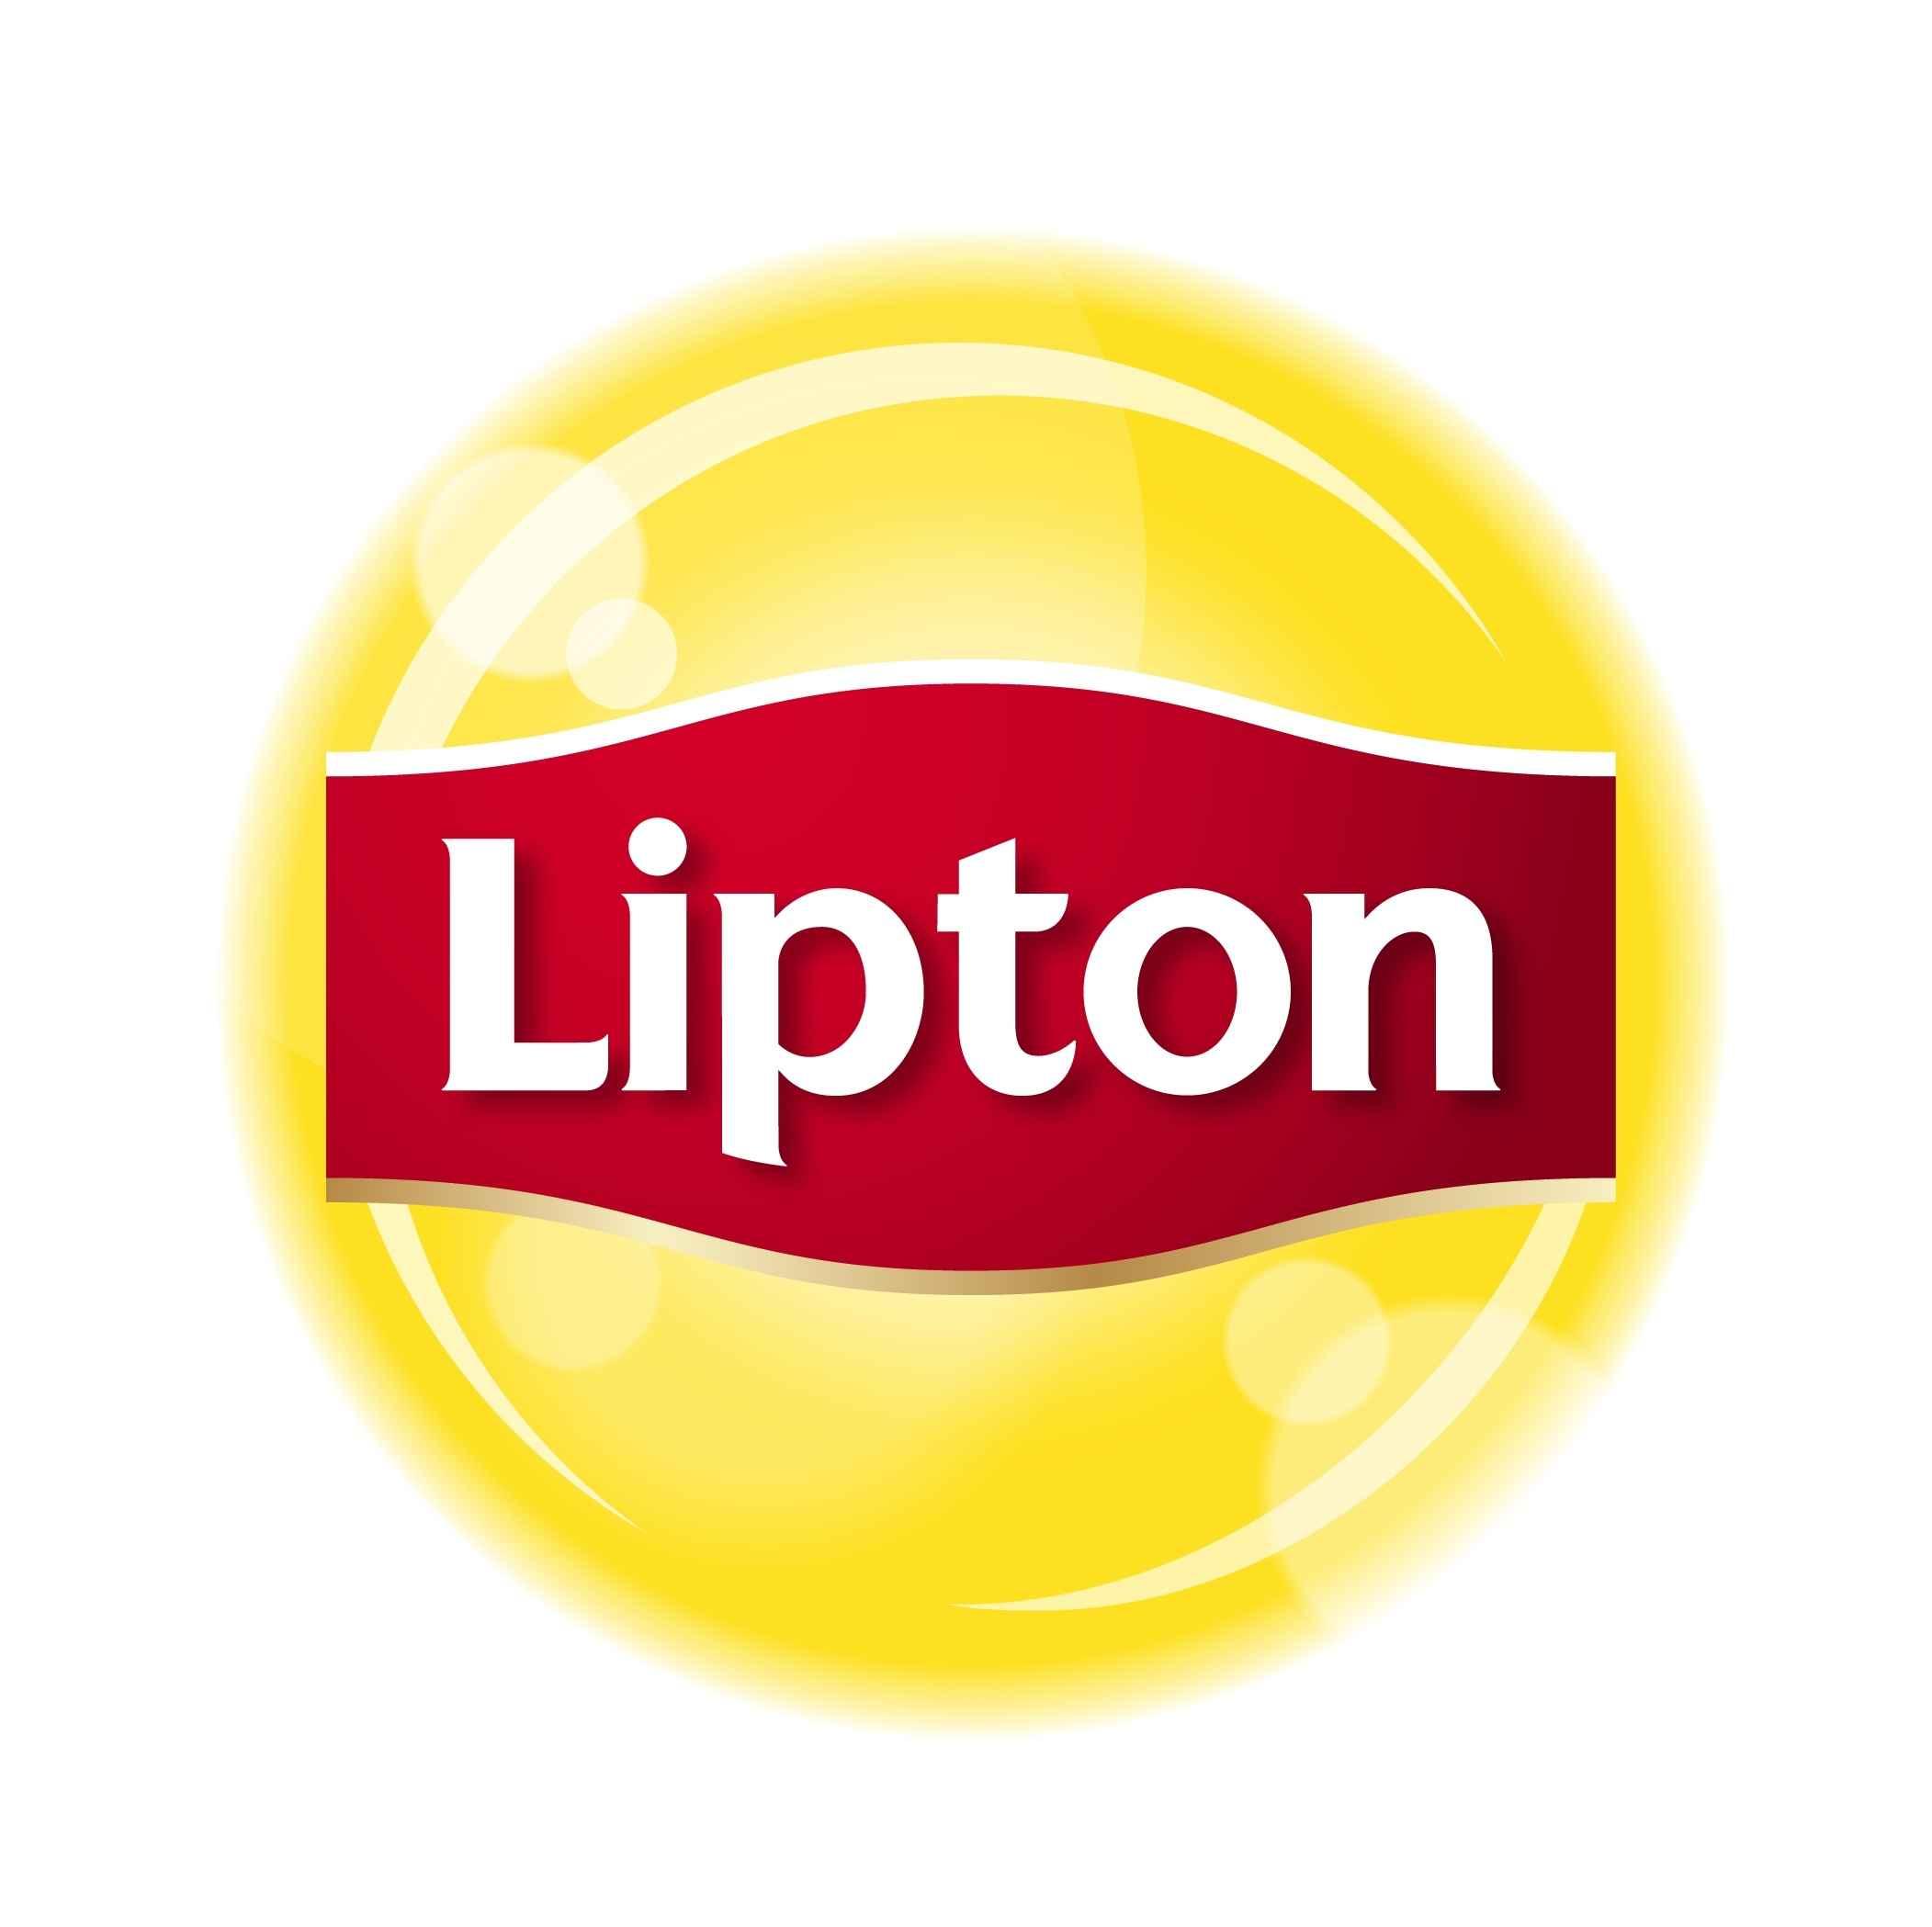 lipton-logo